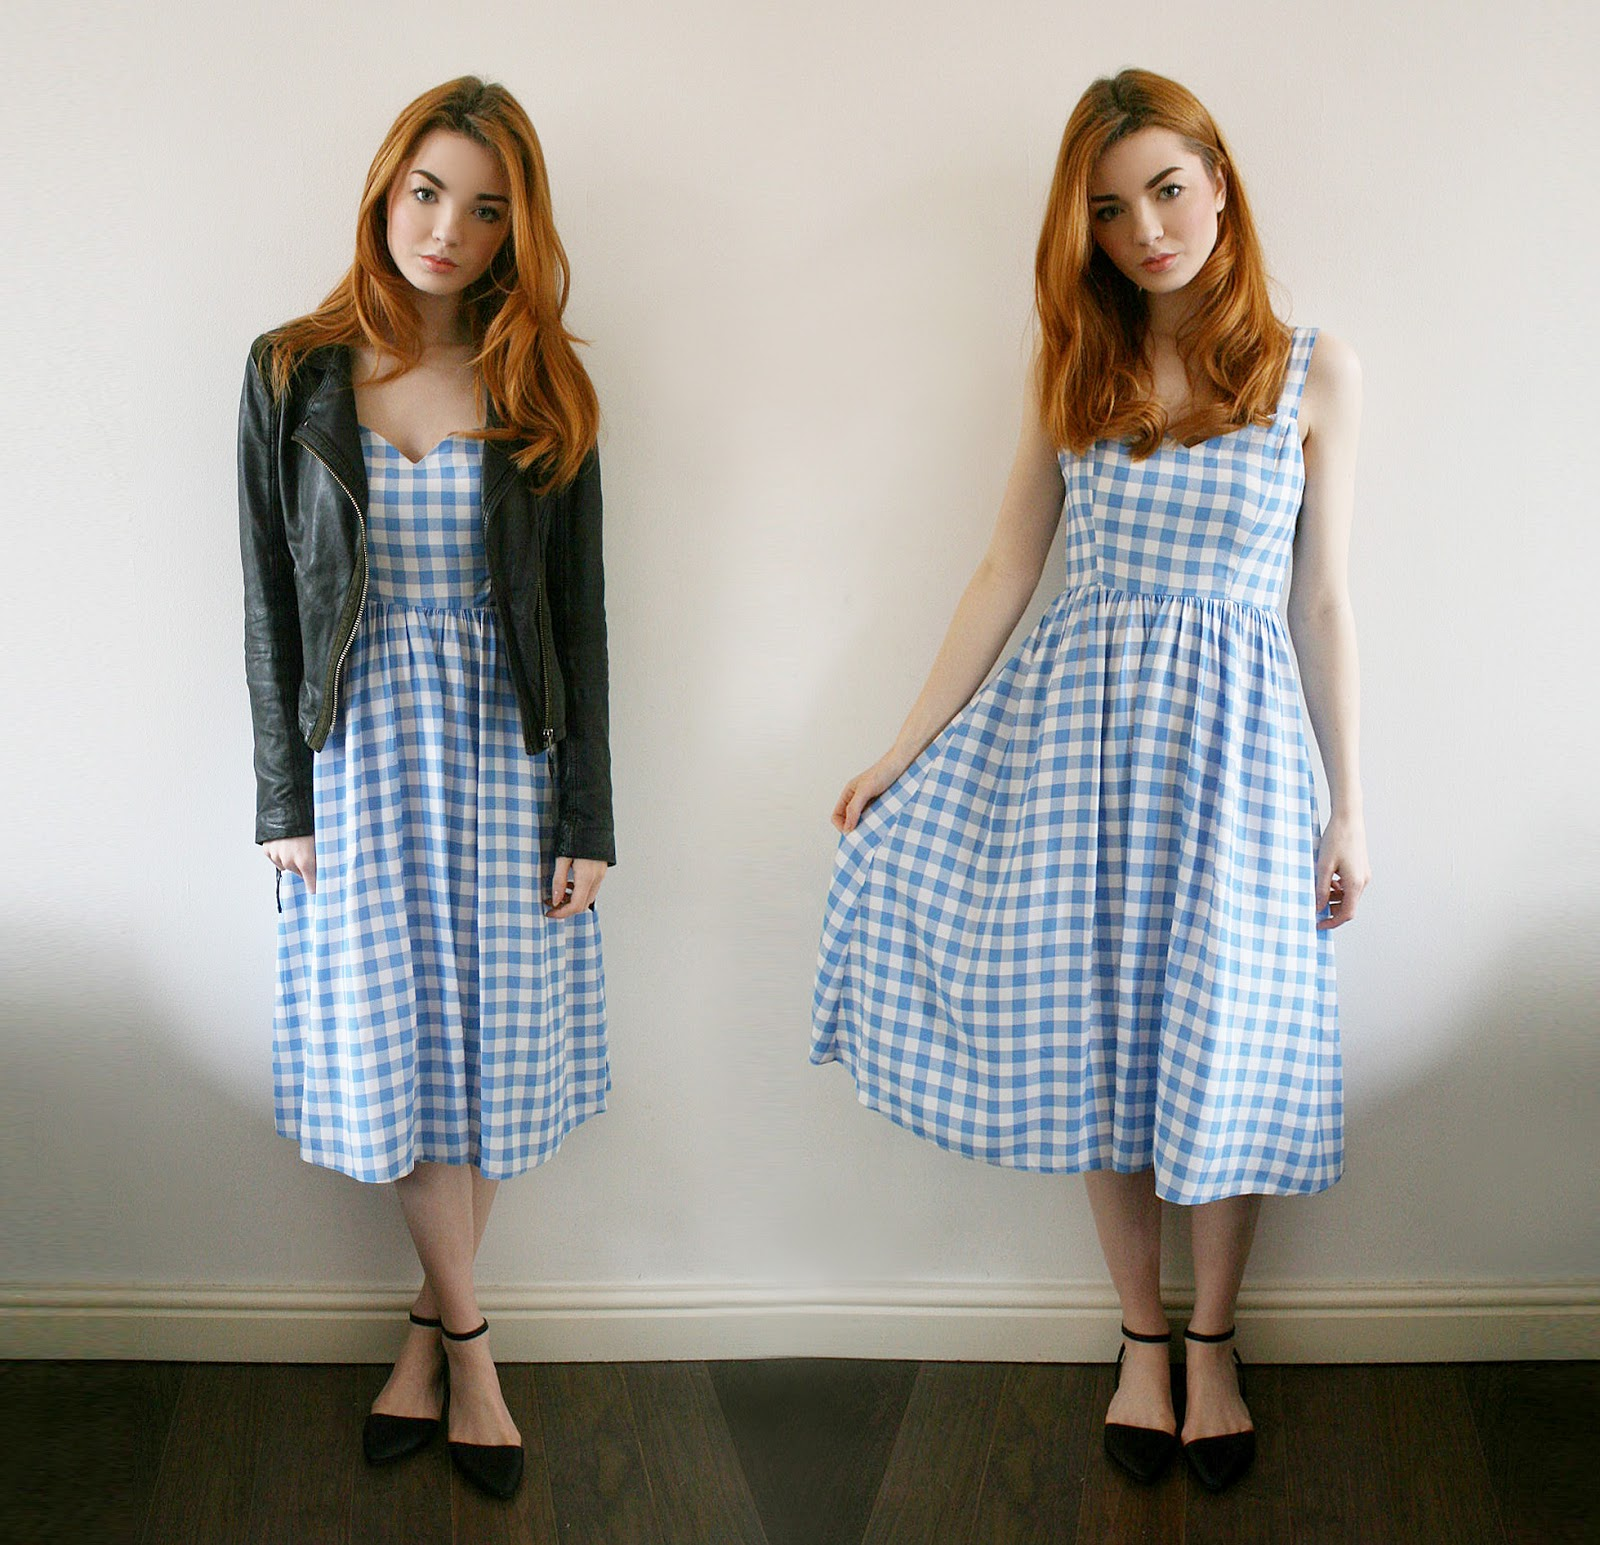 Blue Gingham Dress - Hannah Louise Fashion